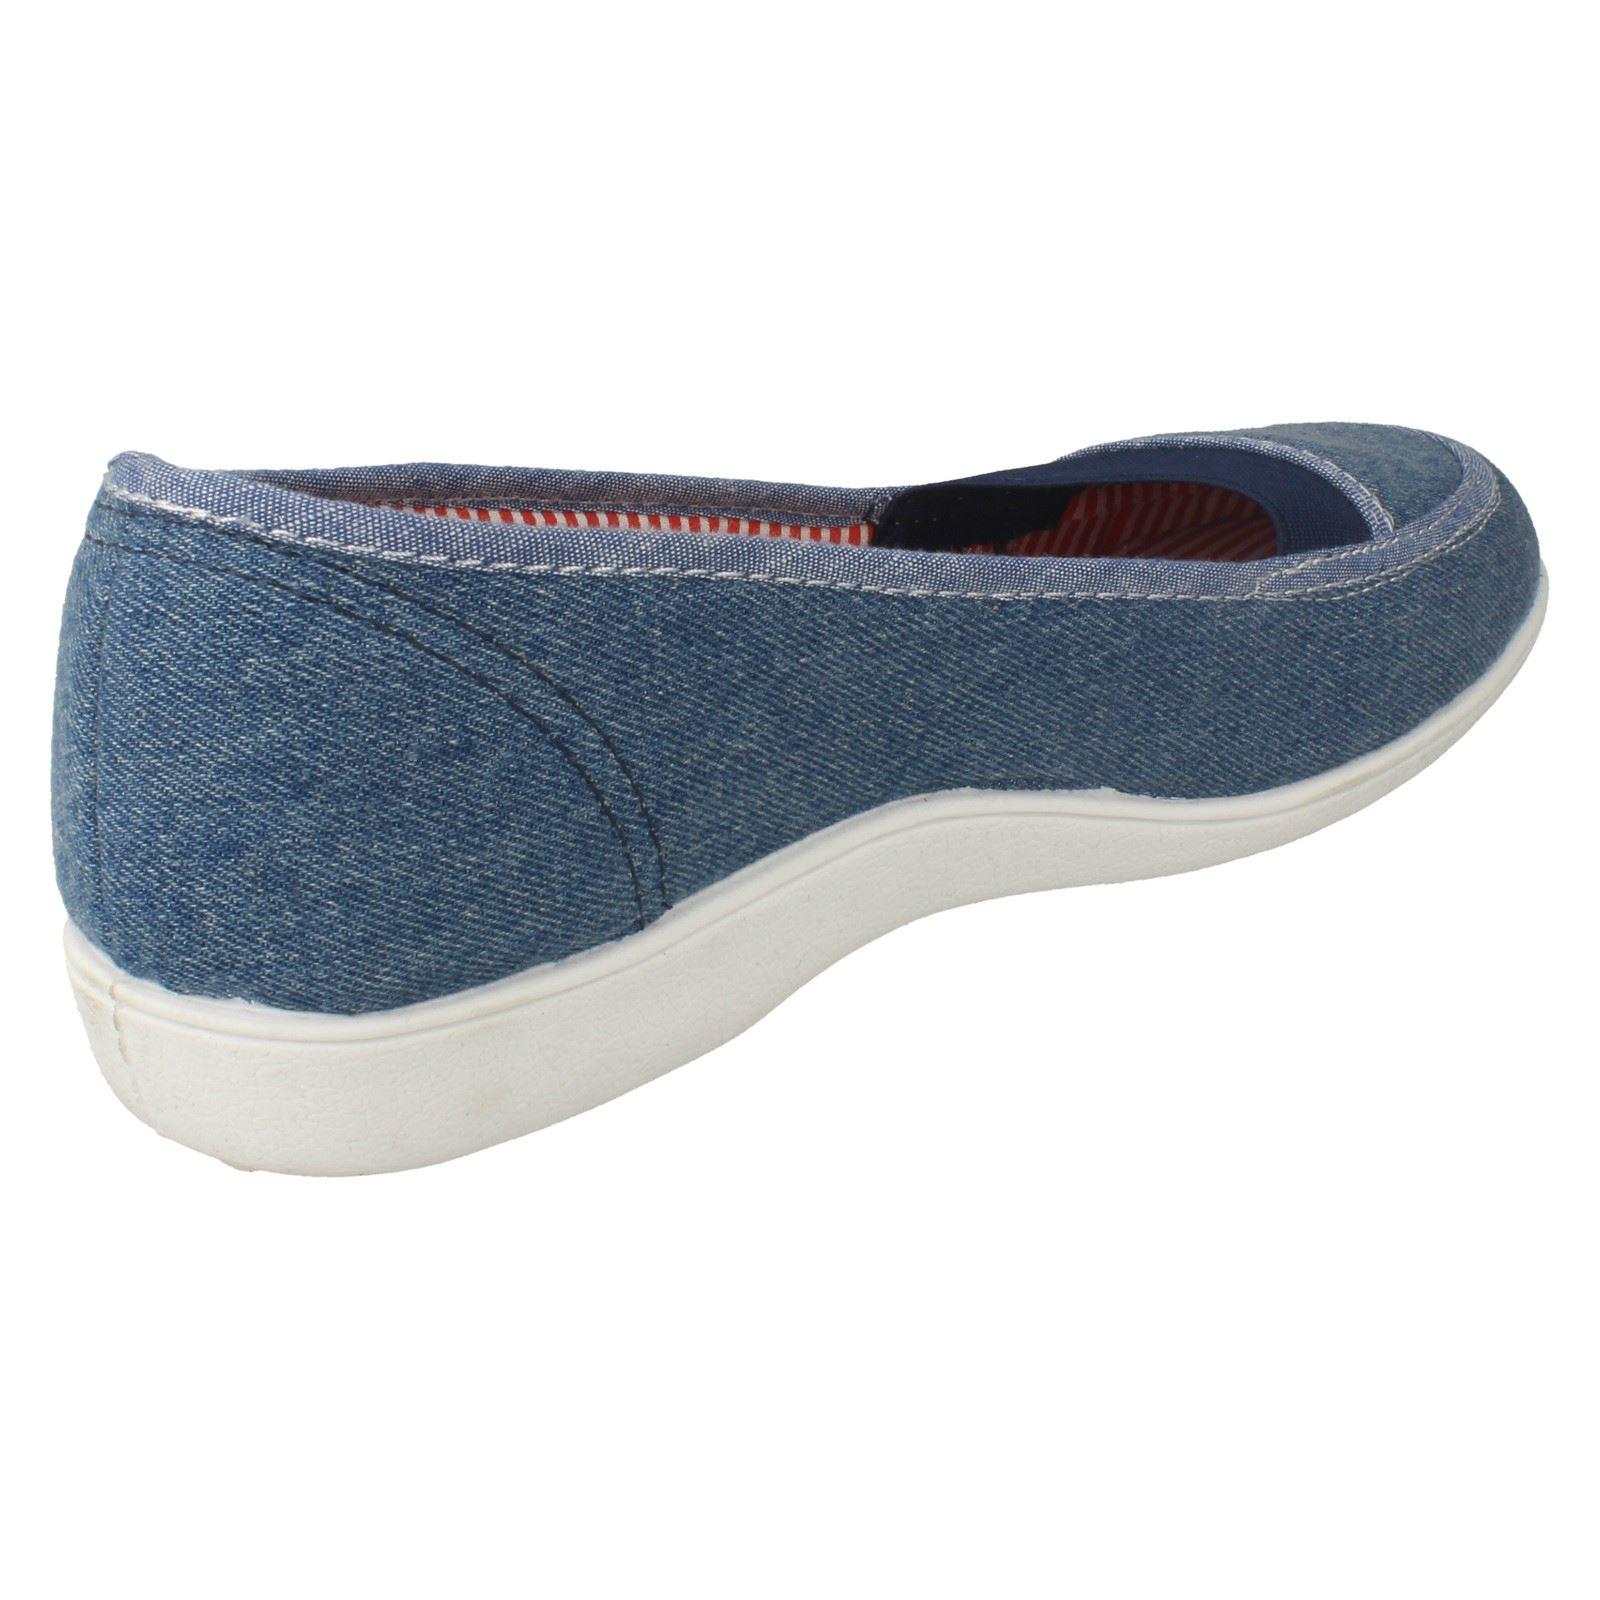 Freestep Ladies Shoes